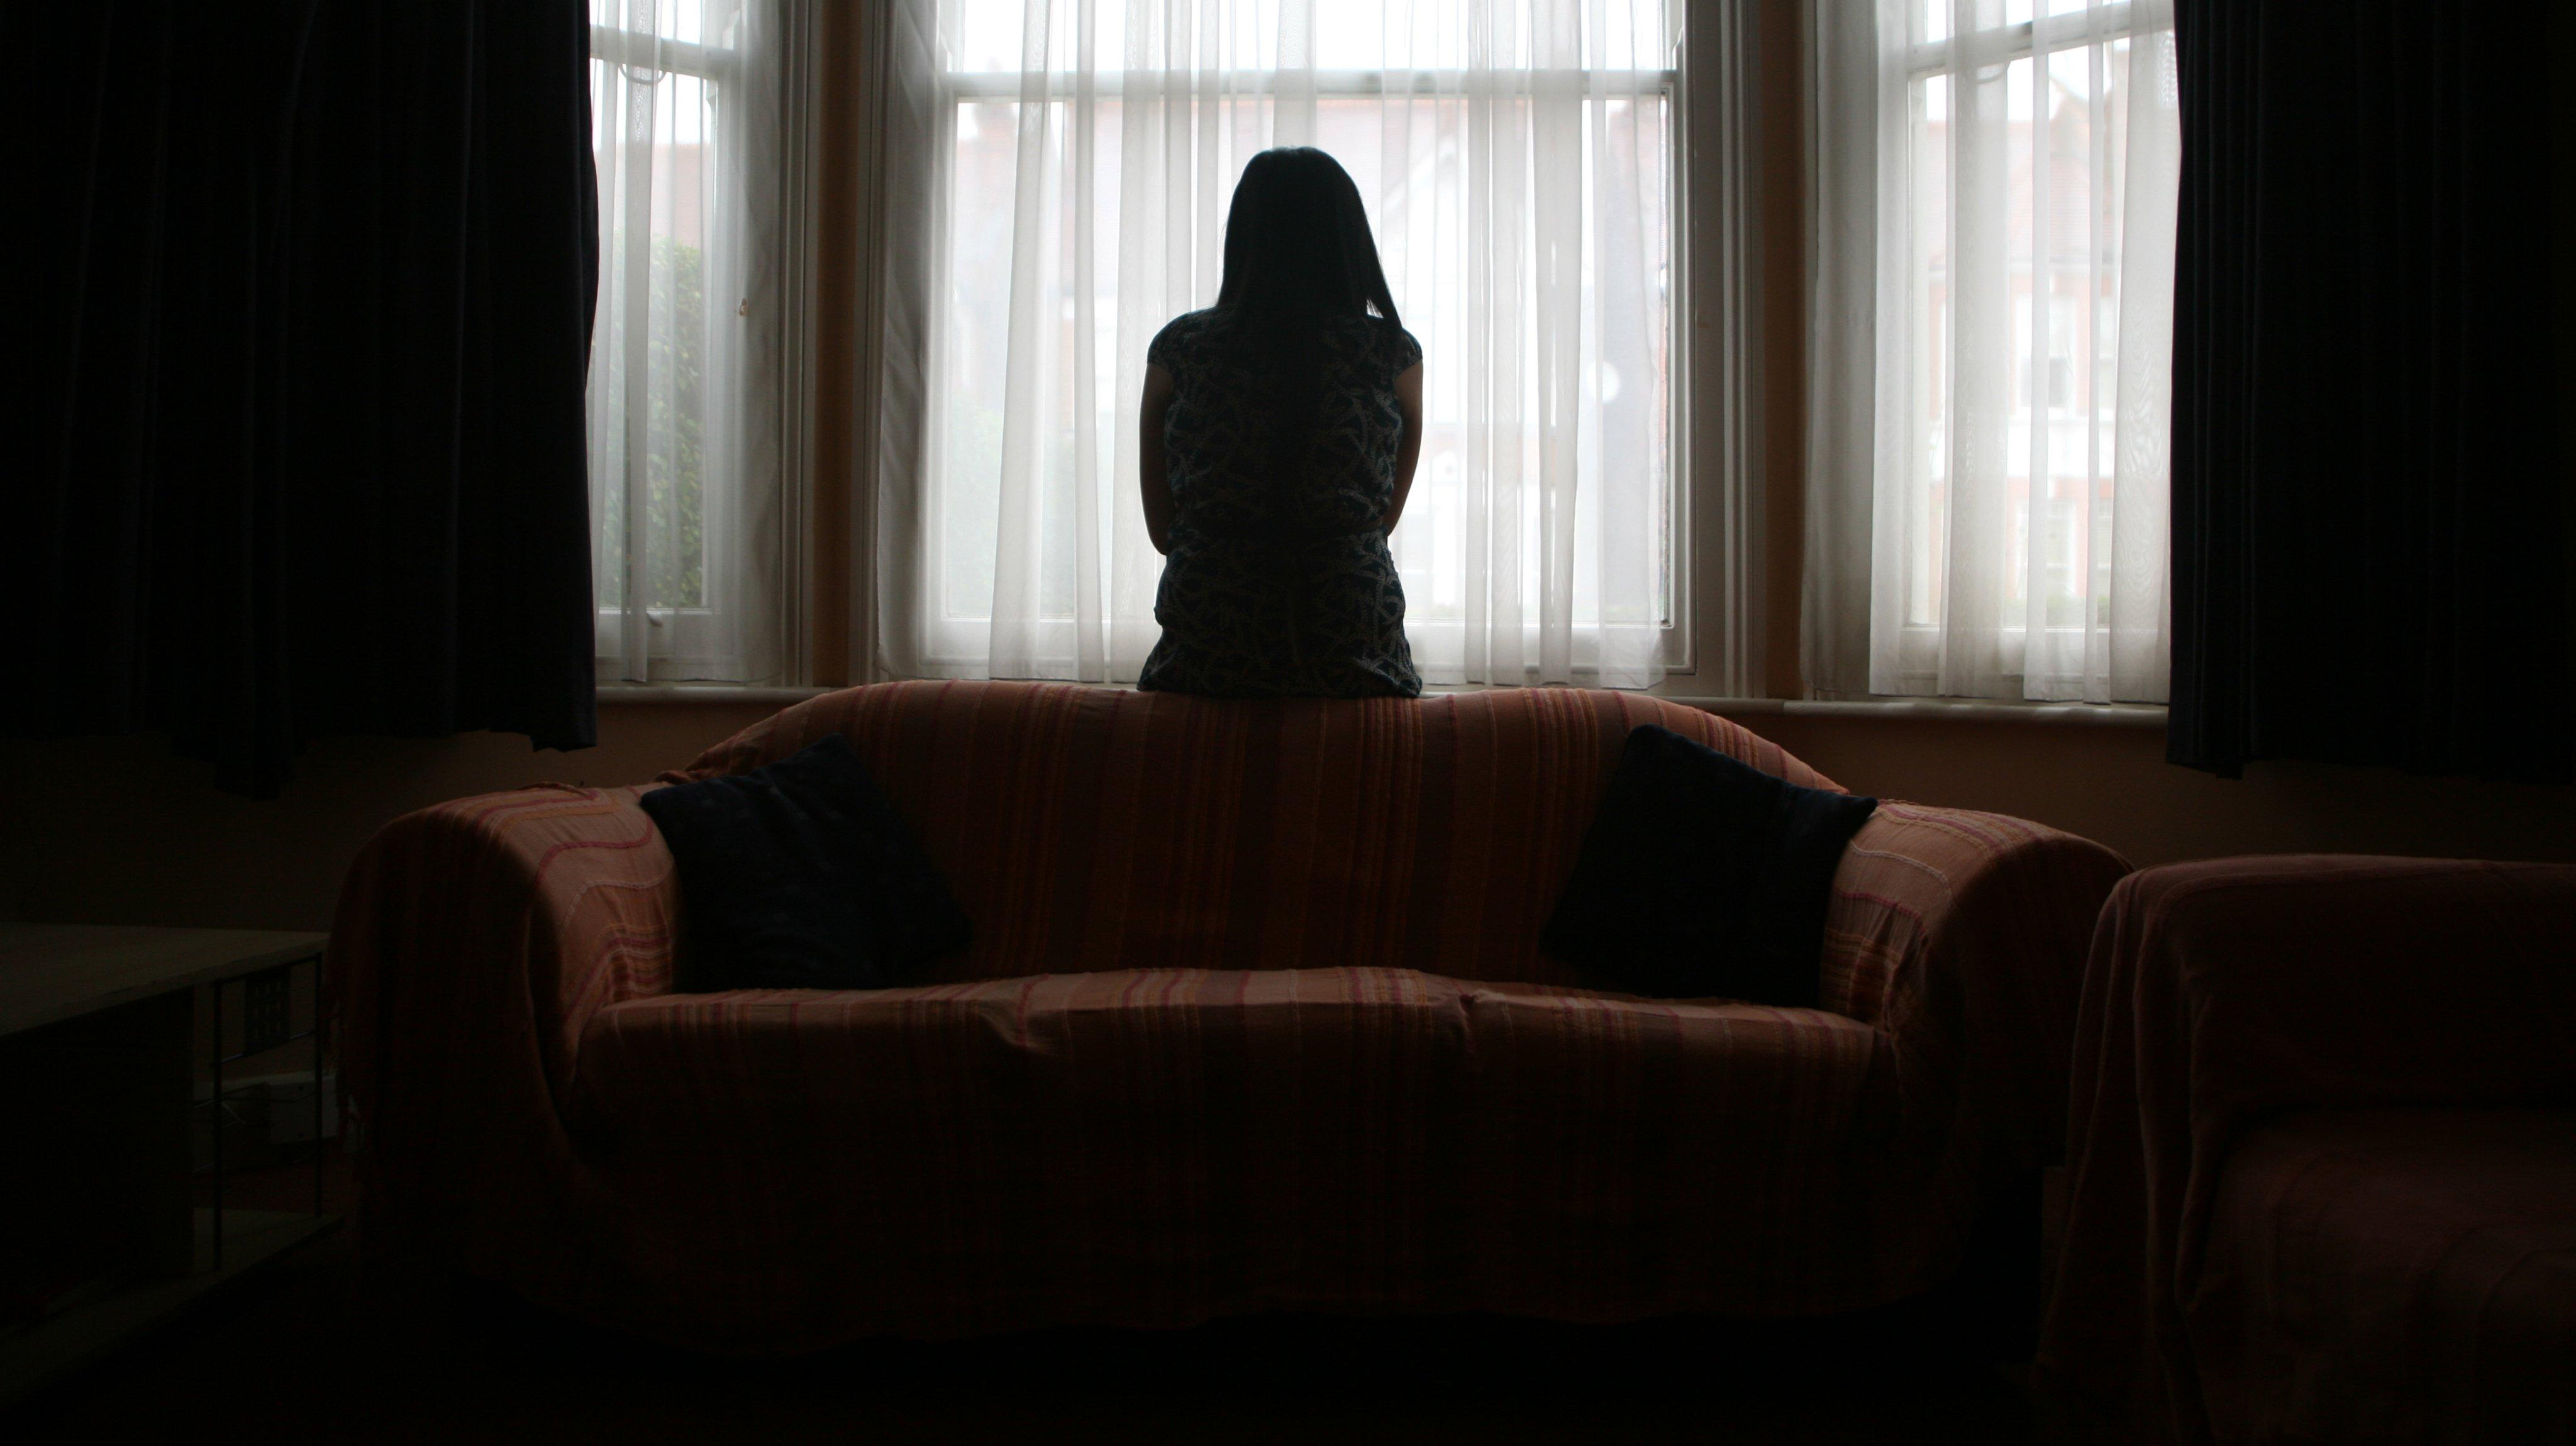 United Kingdom - London - Domestic violence